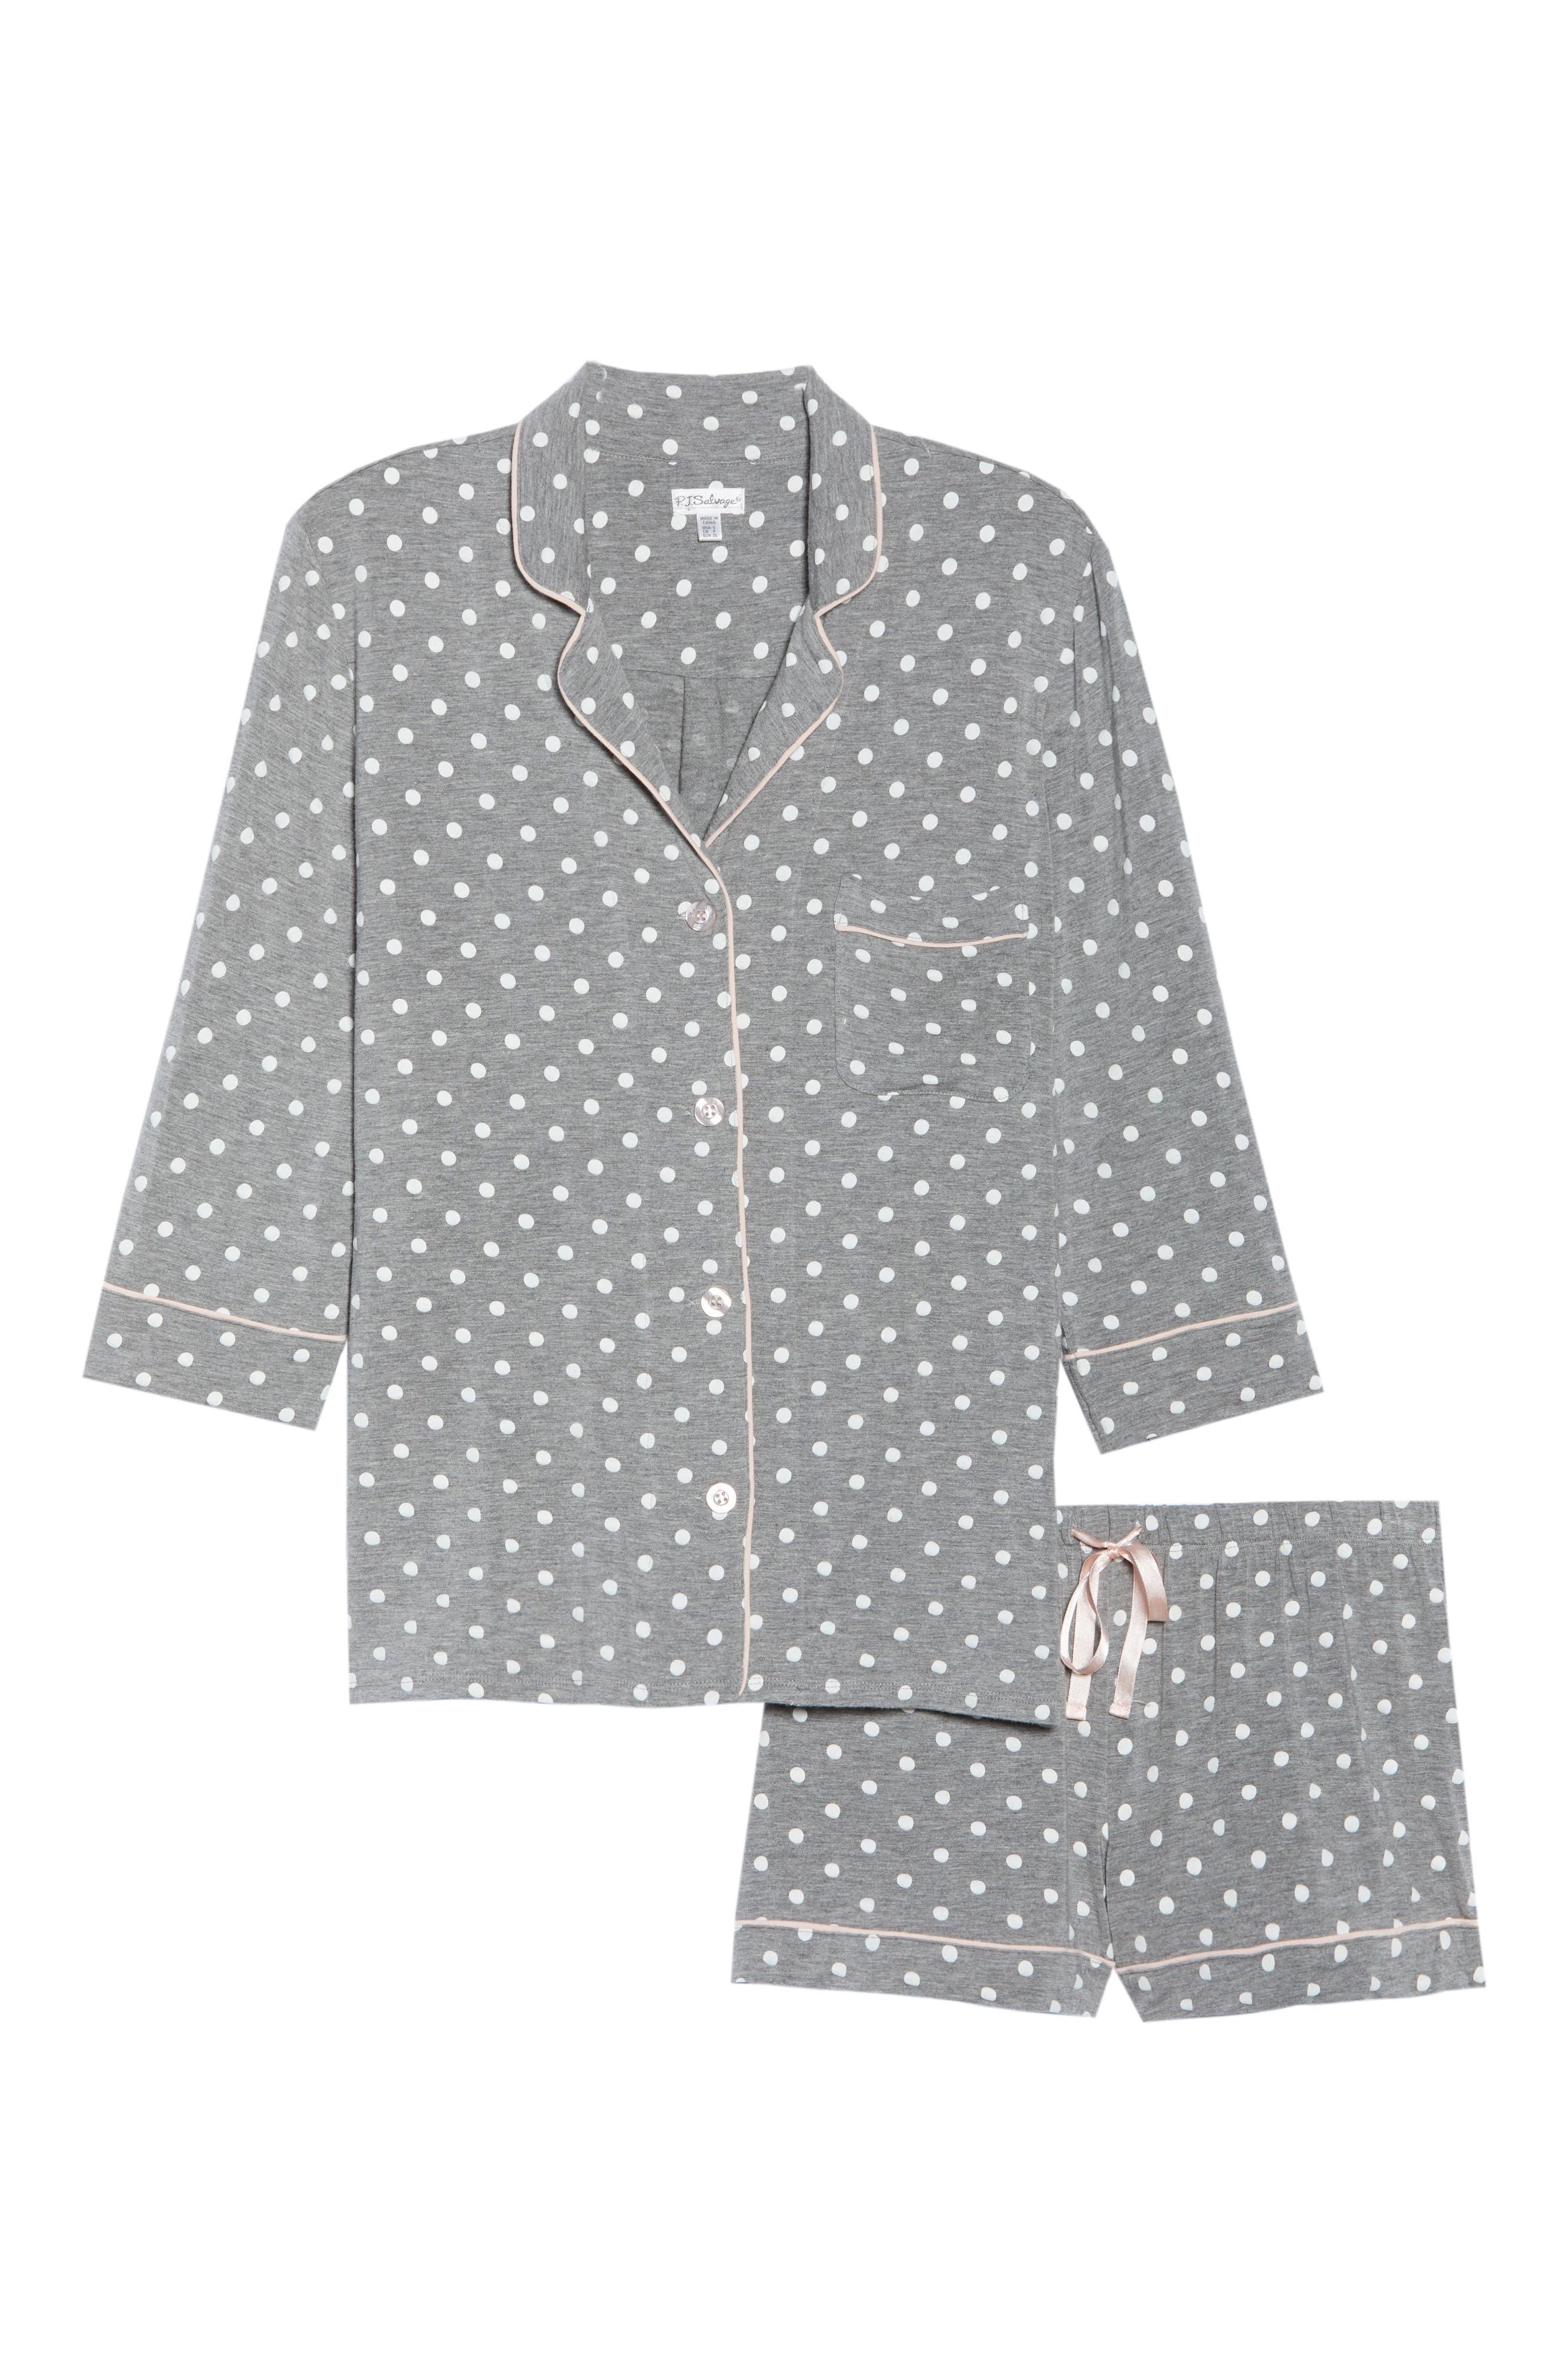 Modal Three-Quarter Sleeve Short Pajamas,                             Alternate thumbnail 6, color,                             H GREY